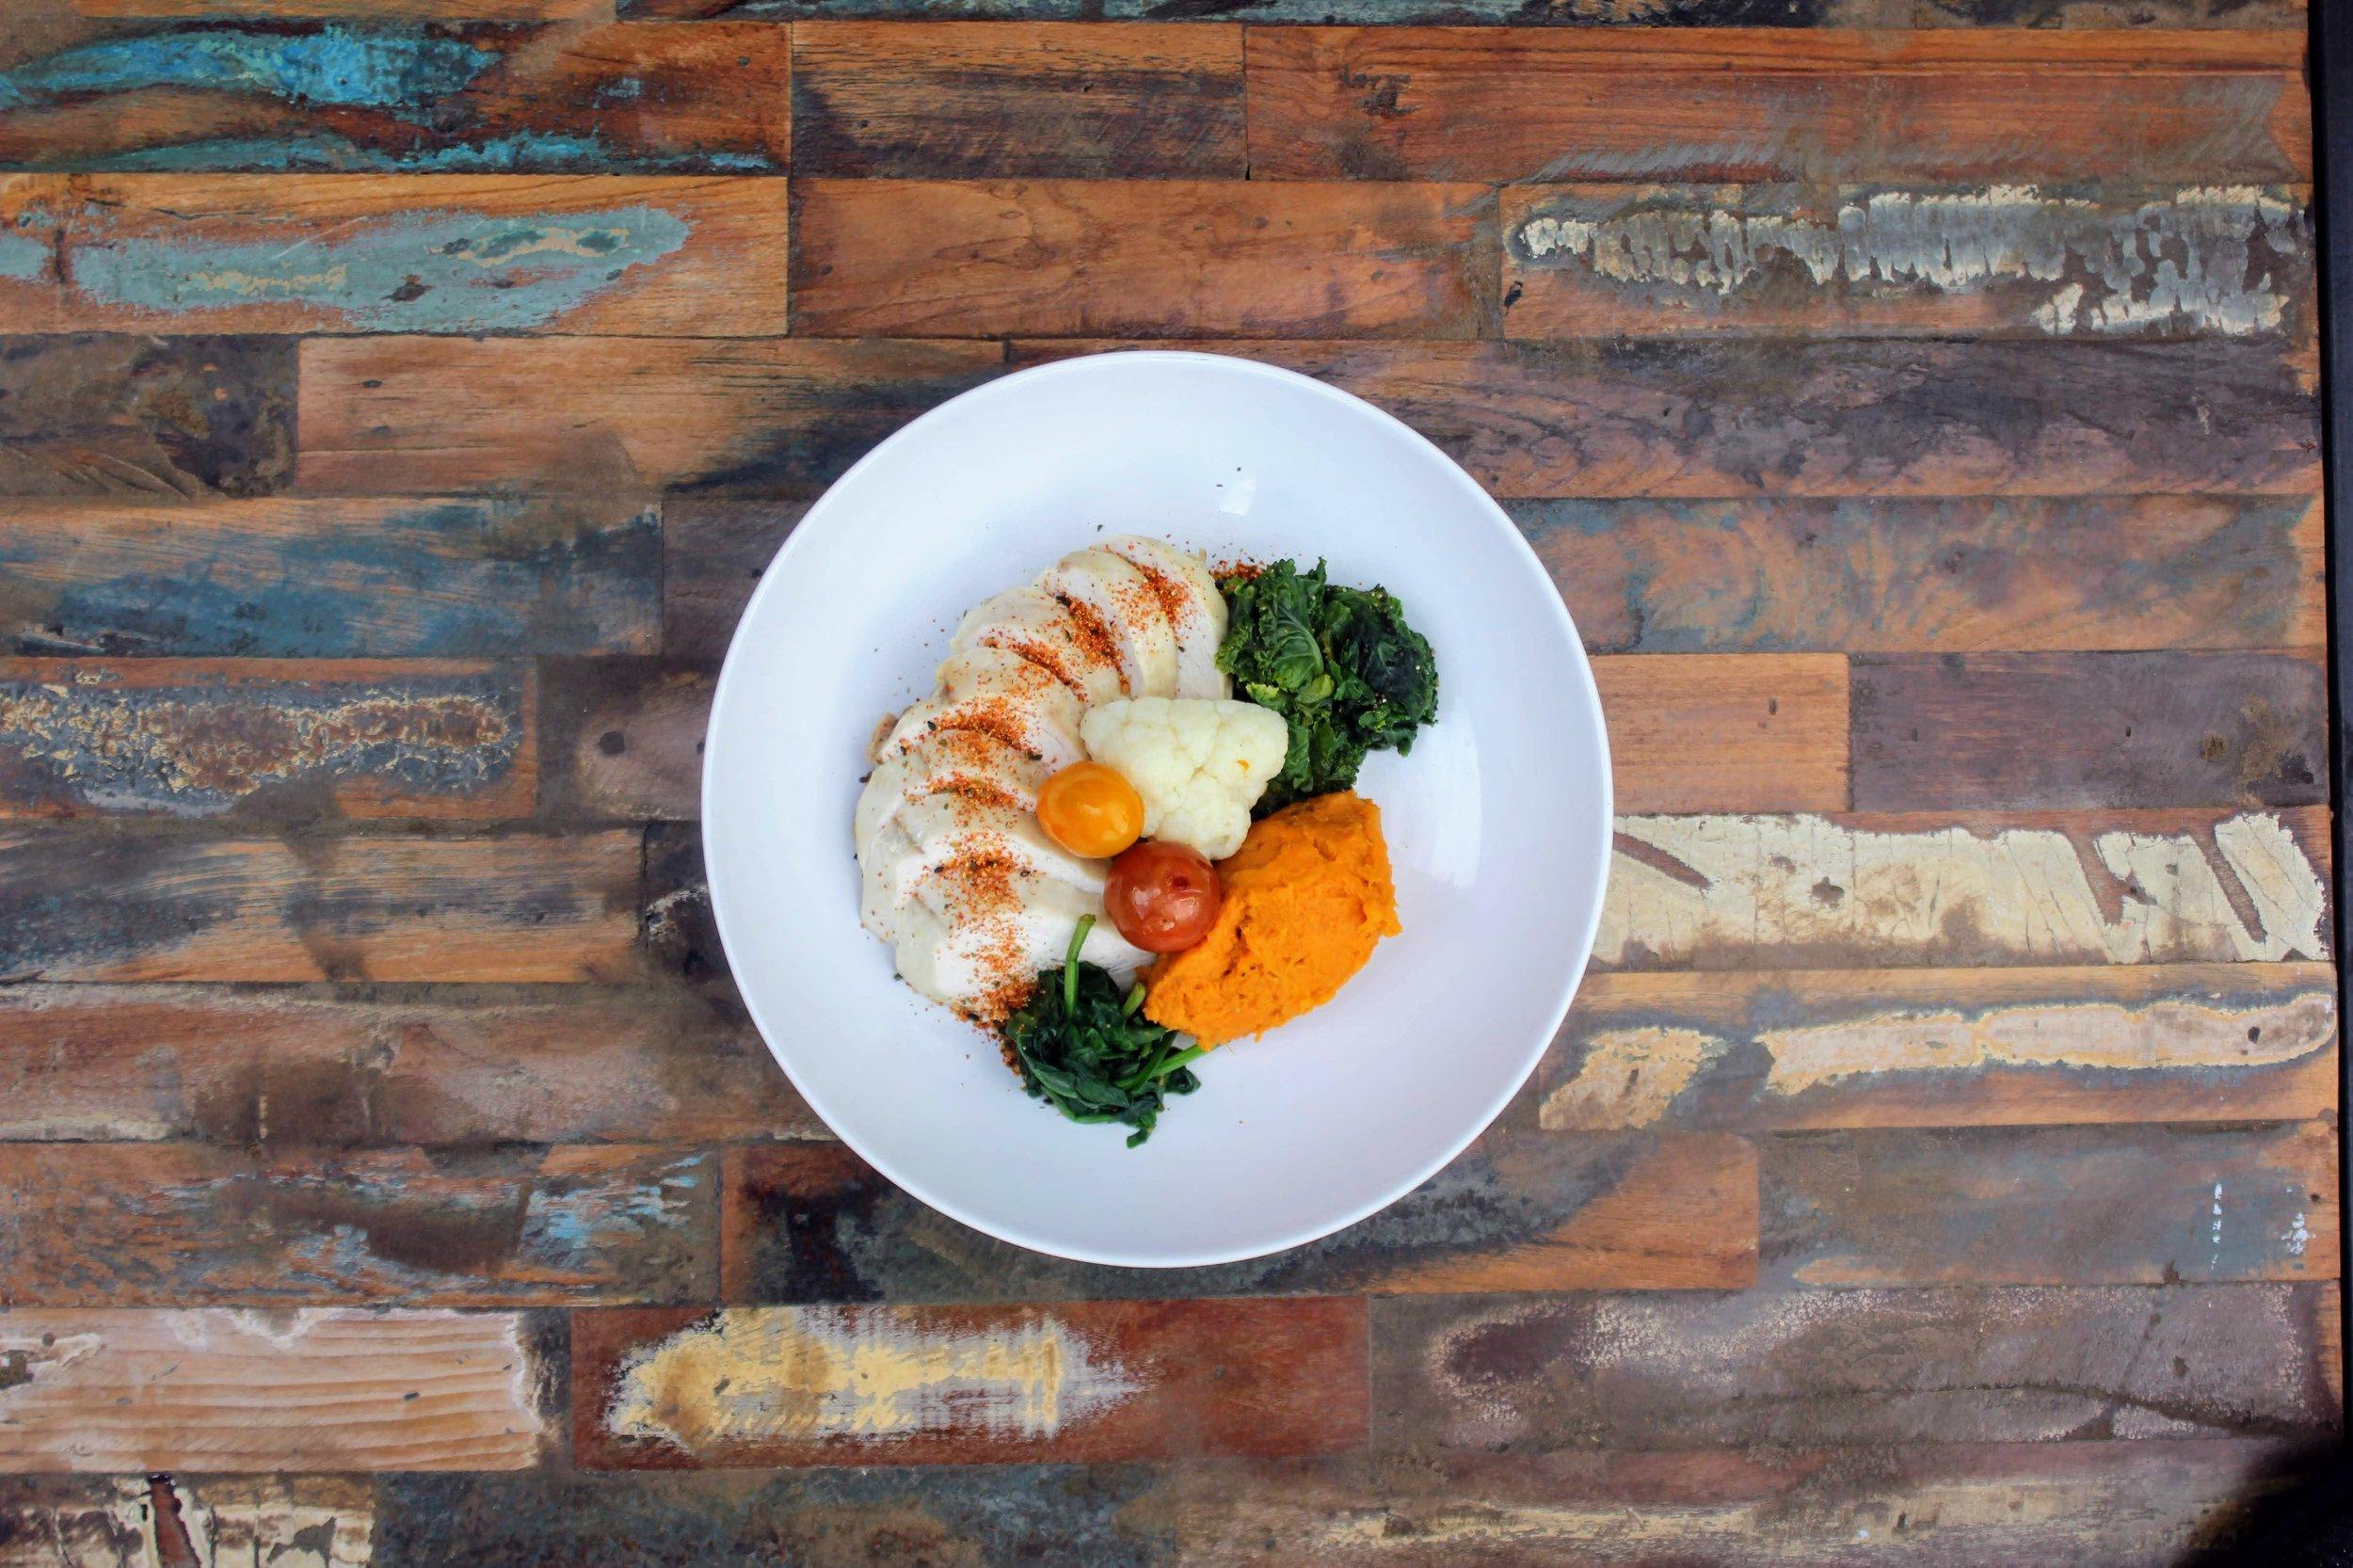 Poached chicken, sweet potato, veg